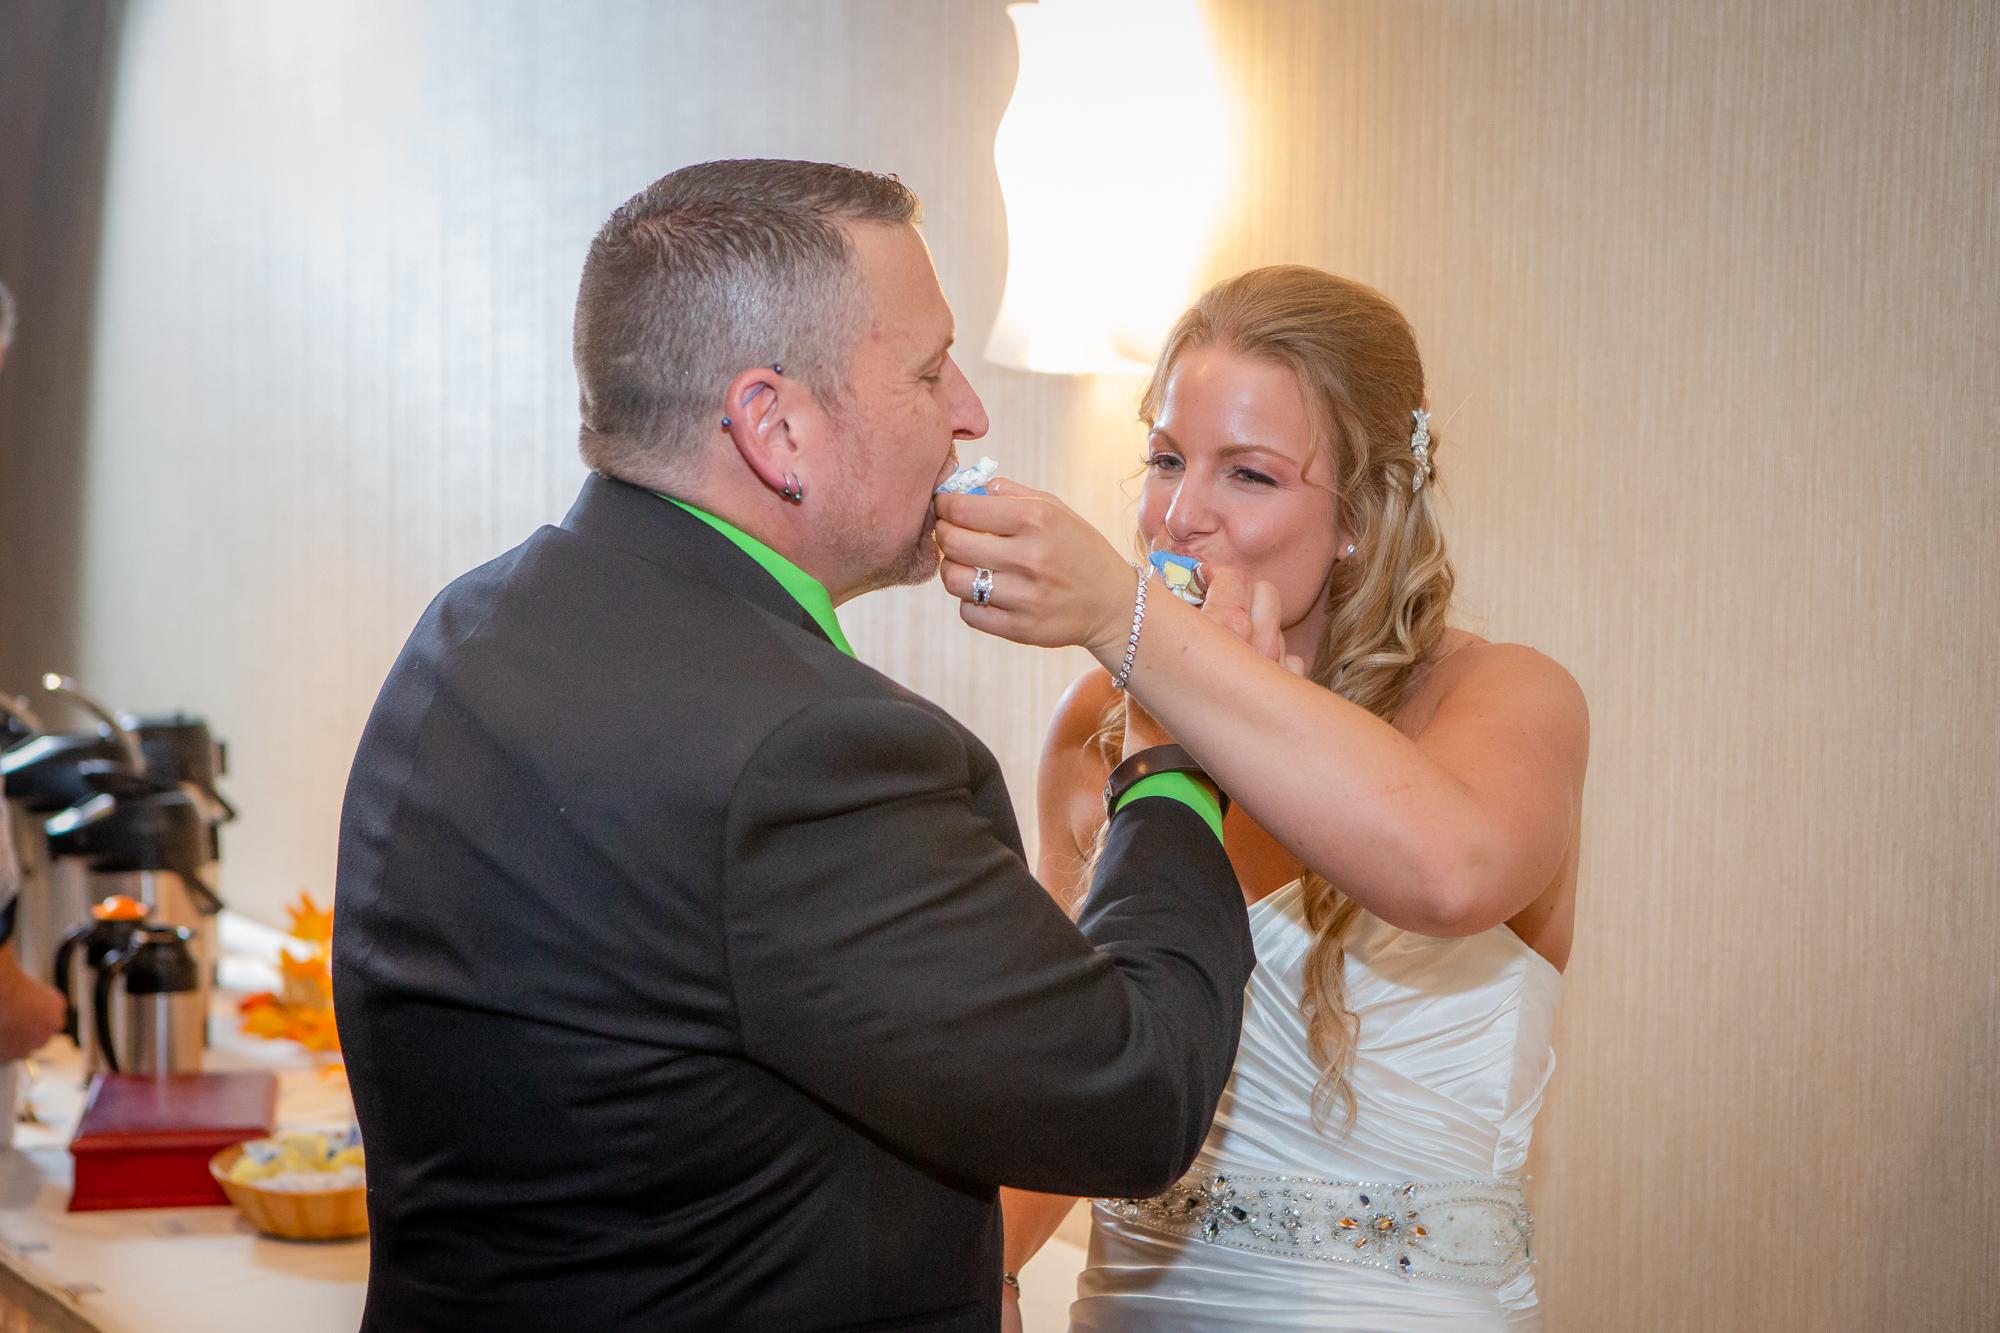 Raddison-Hotel-Corning-NY-Wedding-4559.jpg